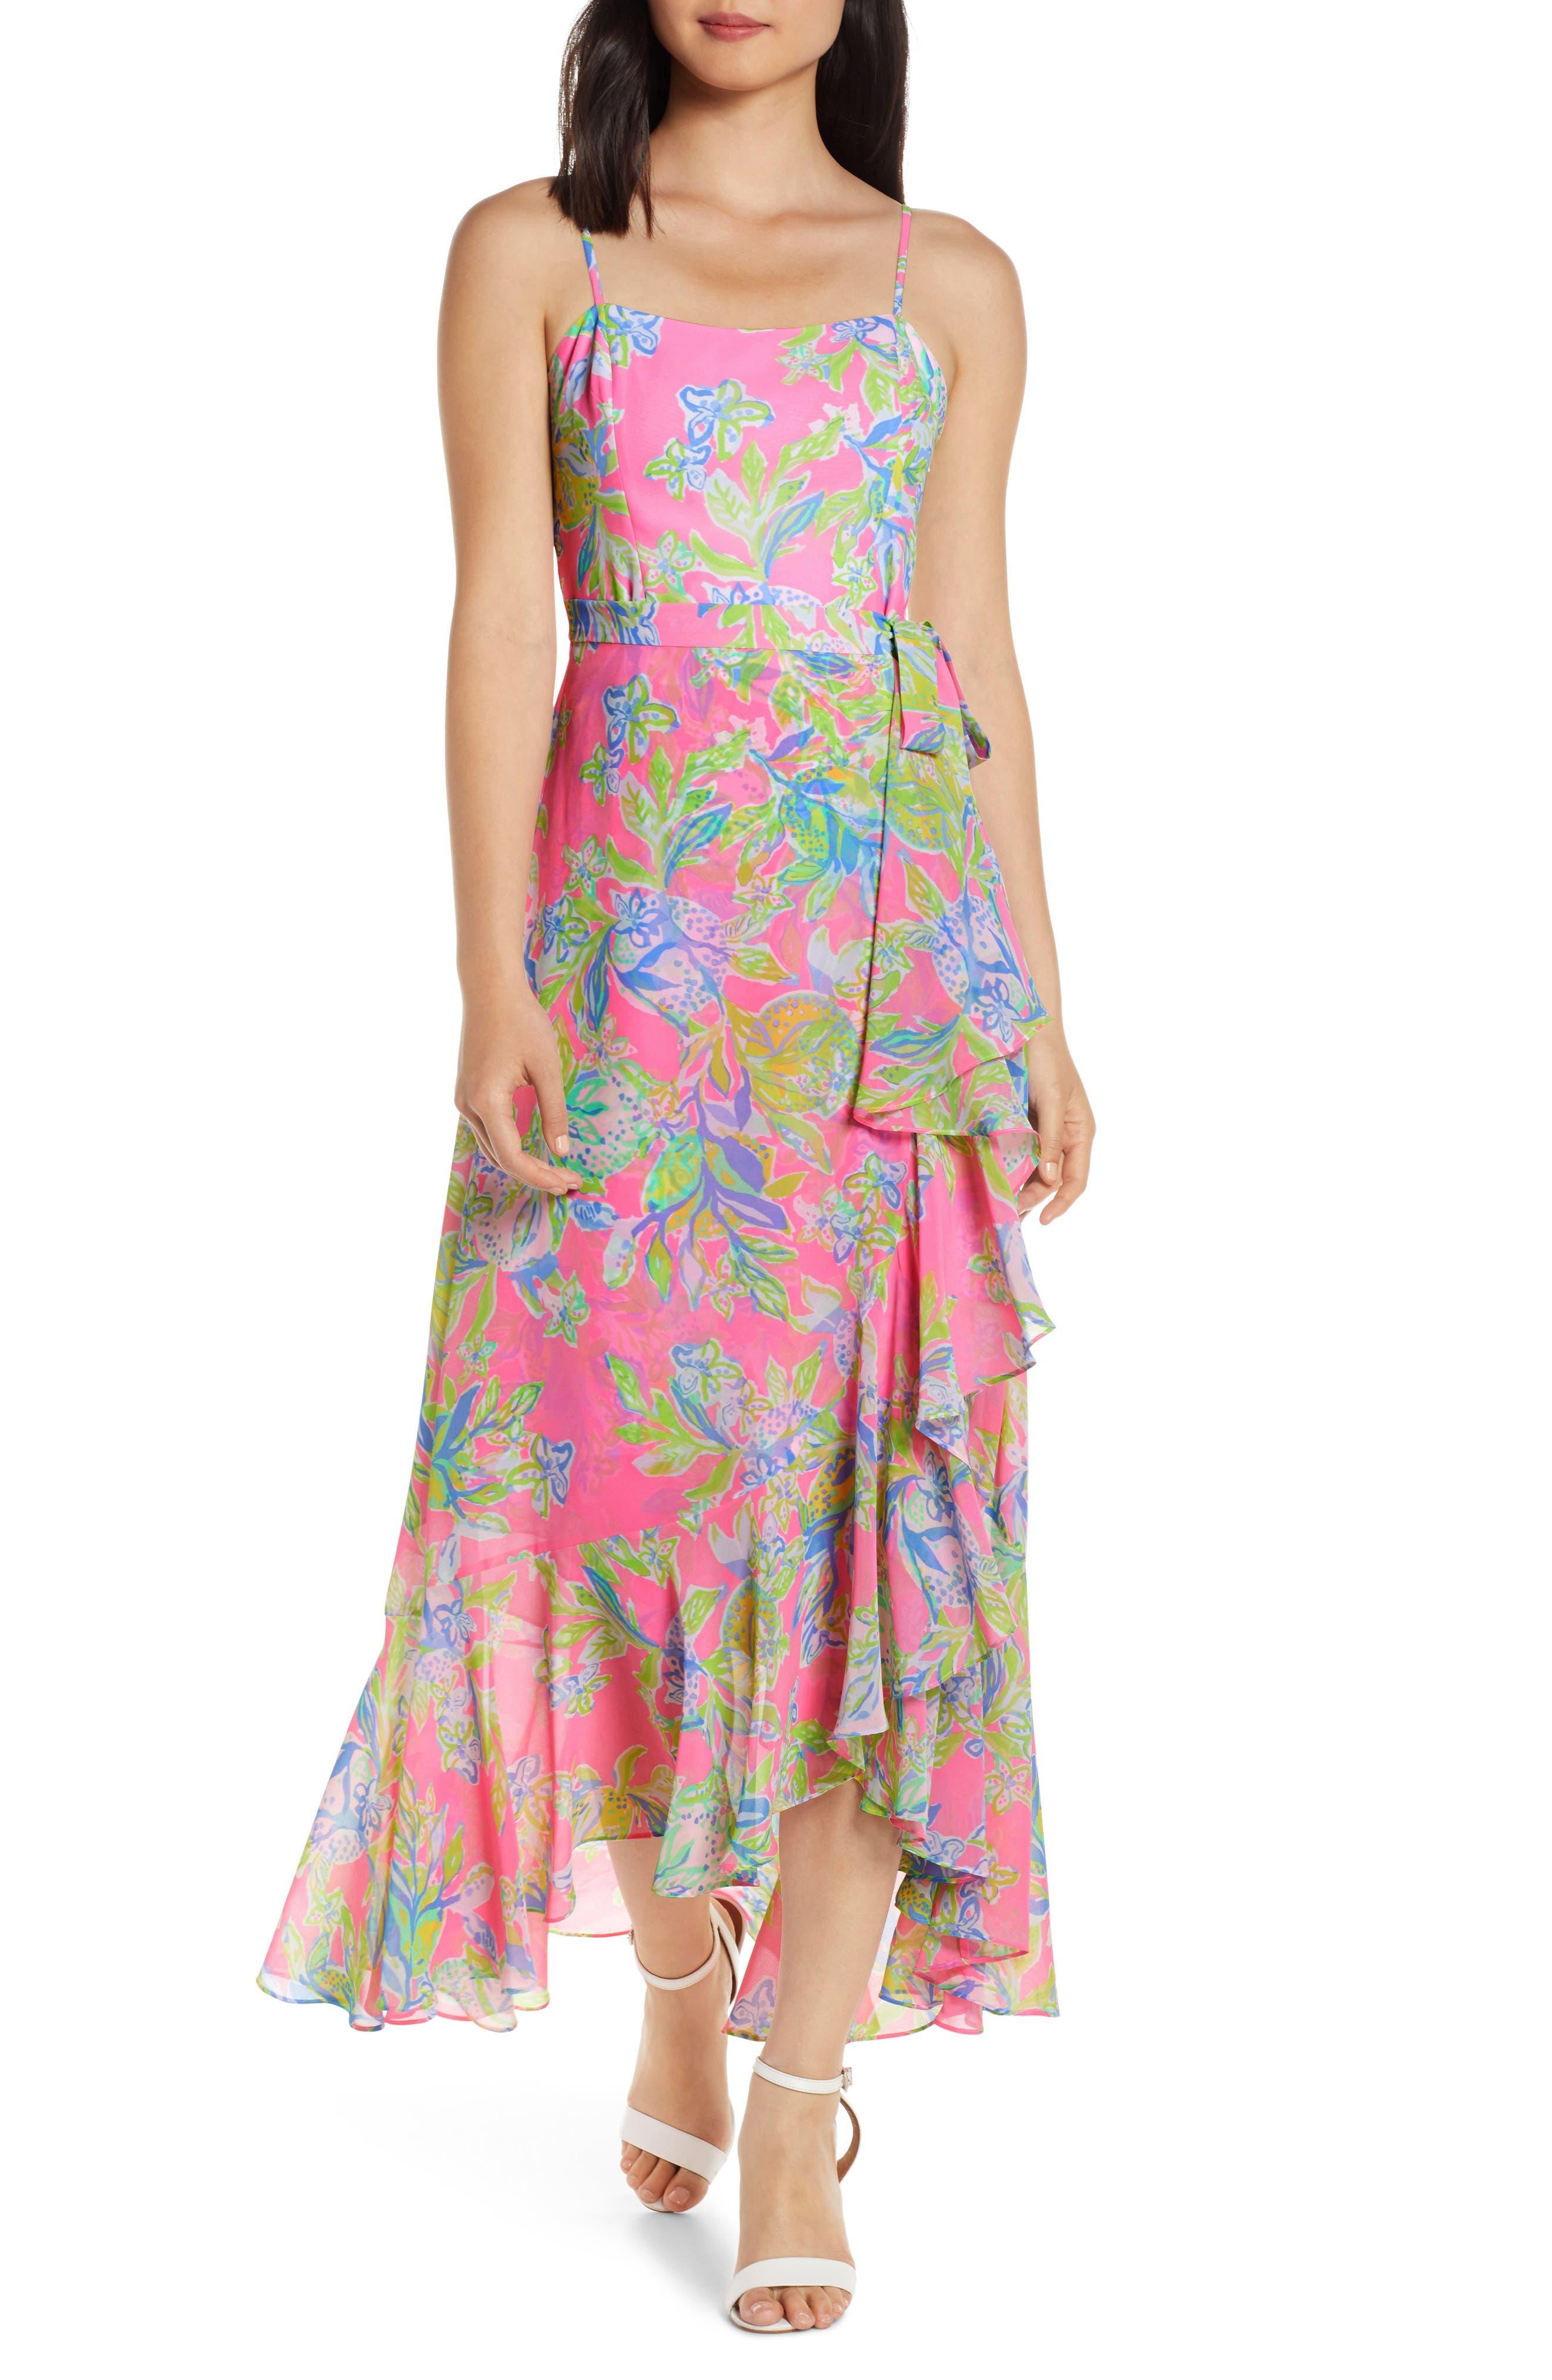 Lilly Pulitzer Anni Sleeveless Maxi Dress, Pink